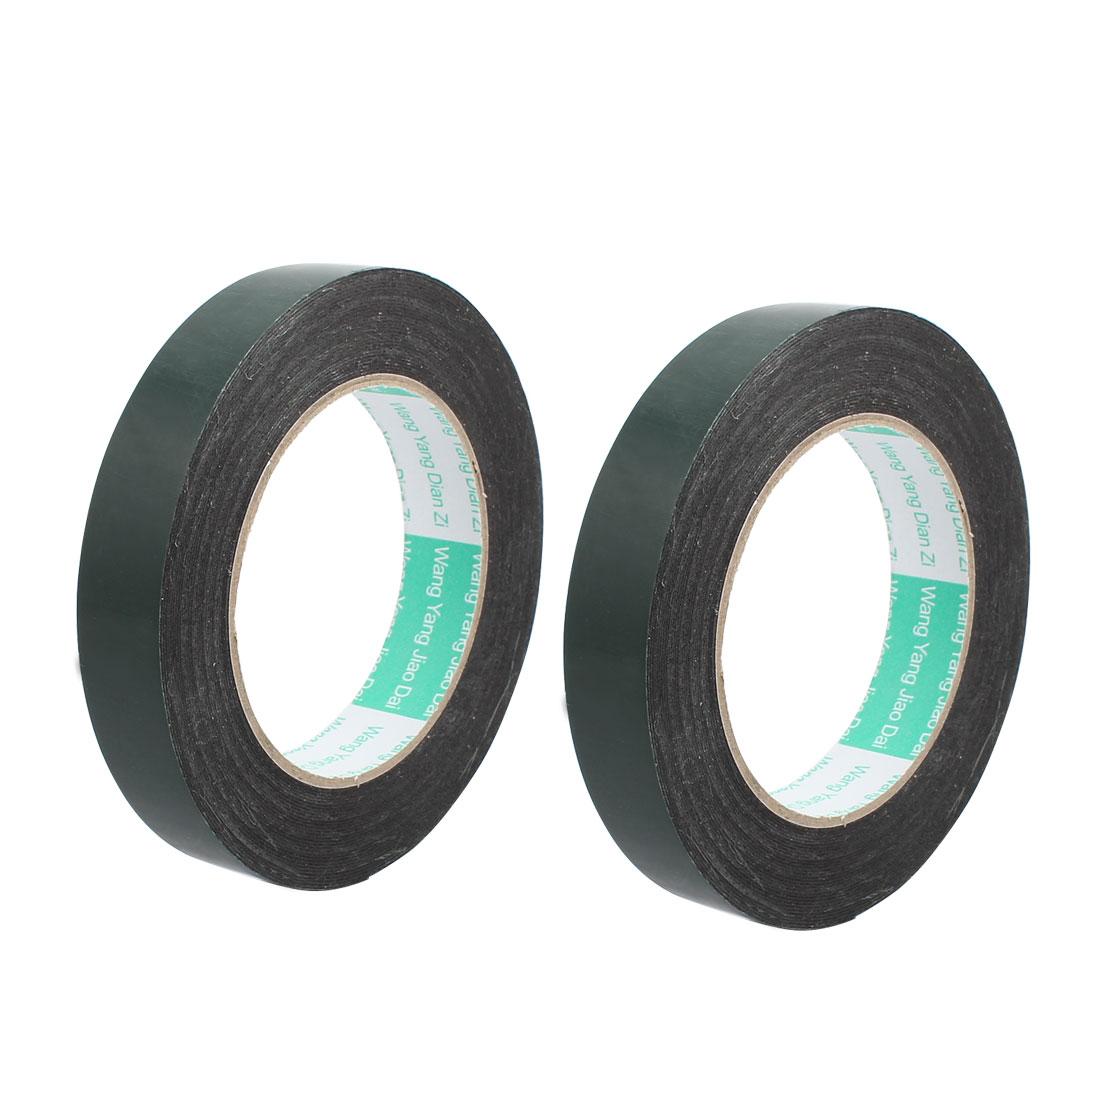 2Pcs 20mmx0.5mm Double Sided Sponge Tape Adhesive Sticker Foam Glue Strip 10m - image 3 de 3